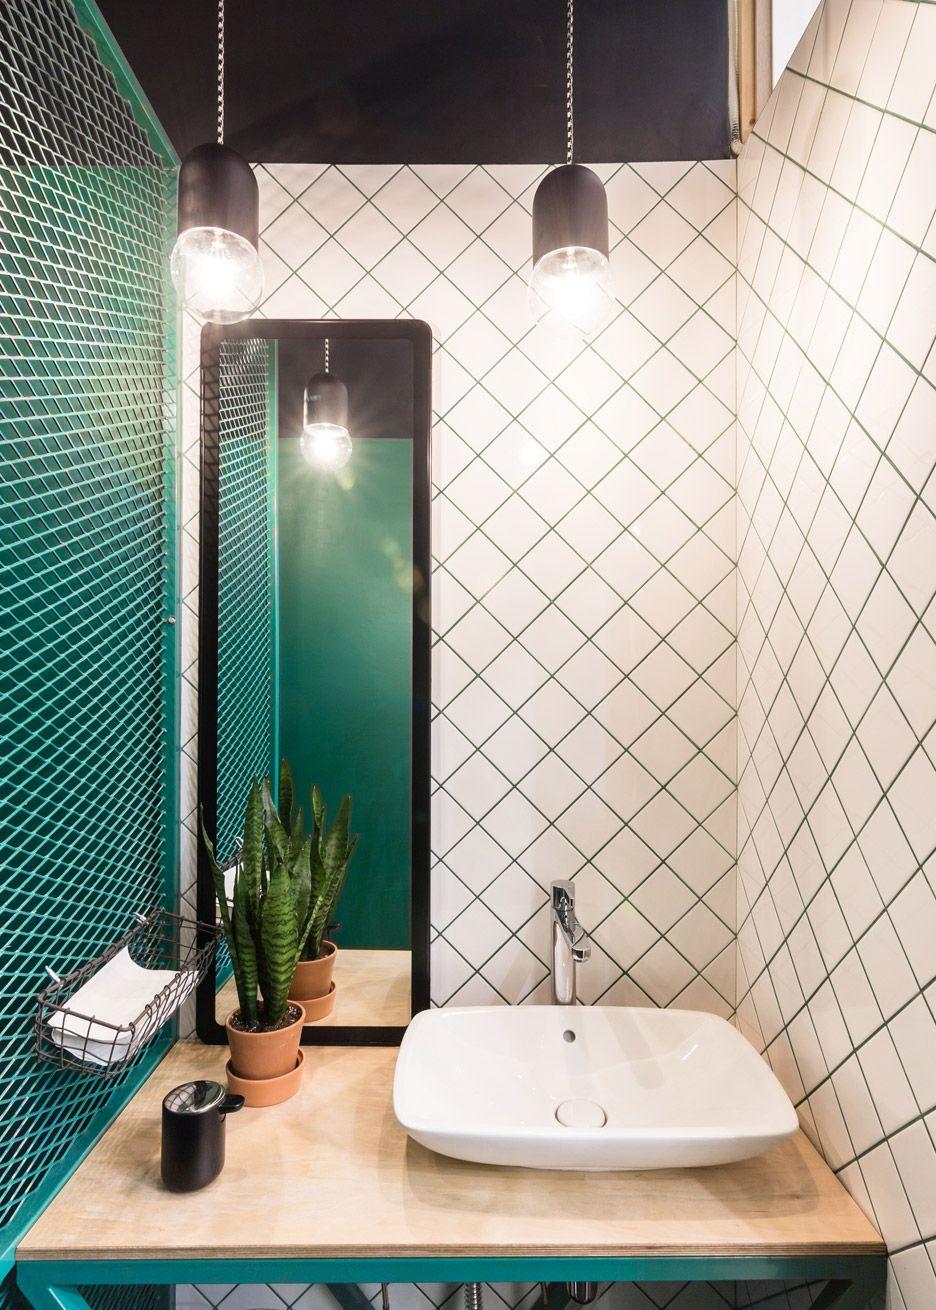 Modern take on 4x4 tiles bathroom design ideas radosti for Bathroom design 4x4